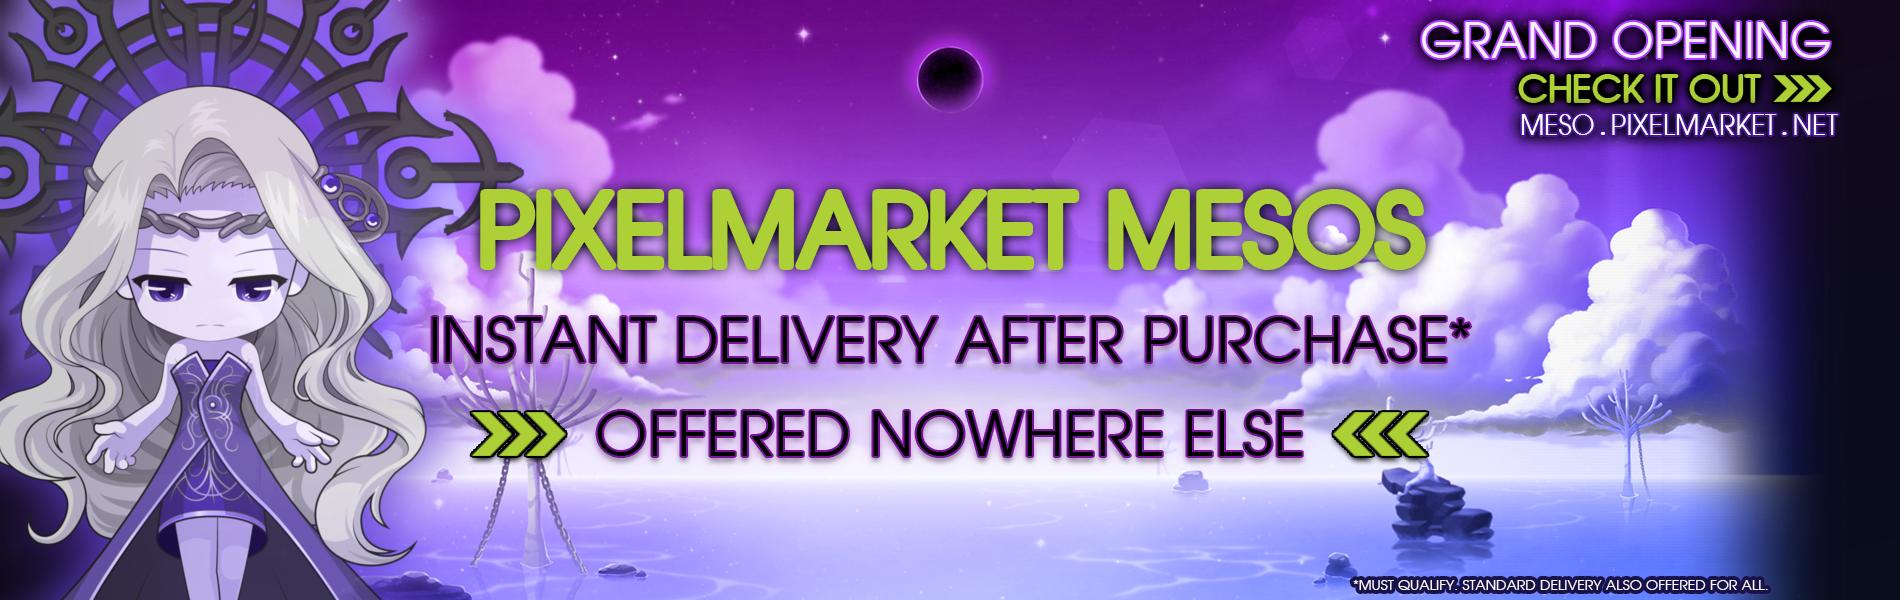 Meso.Pixelmarket.net